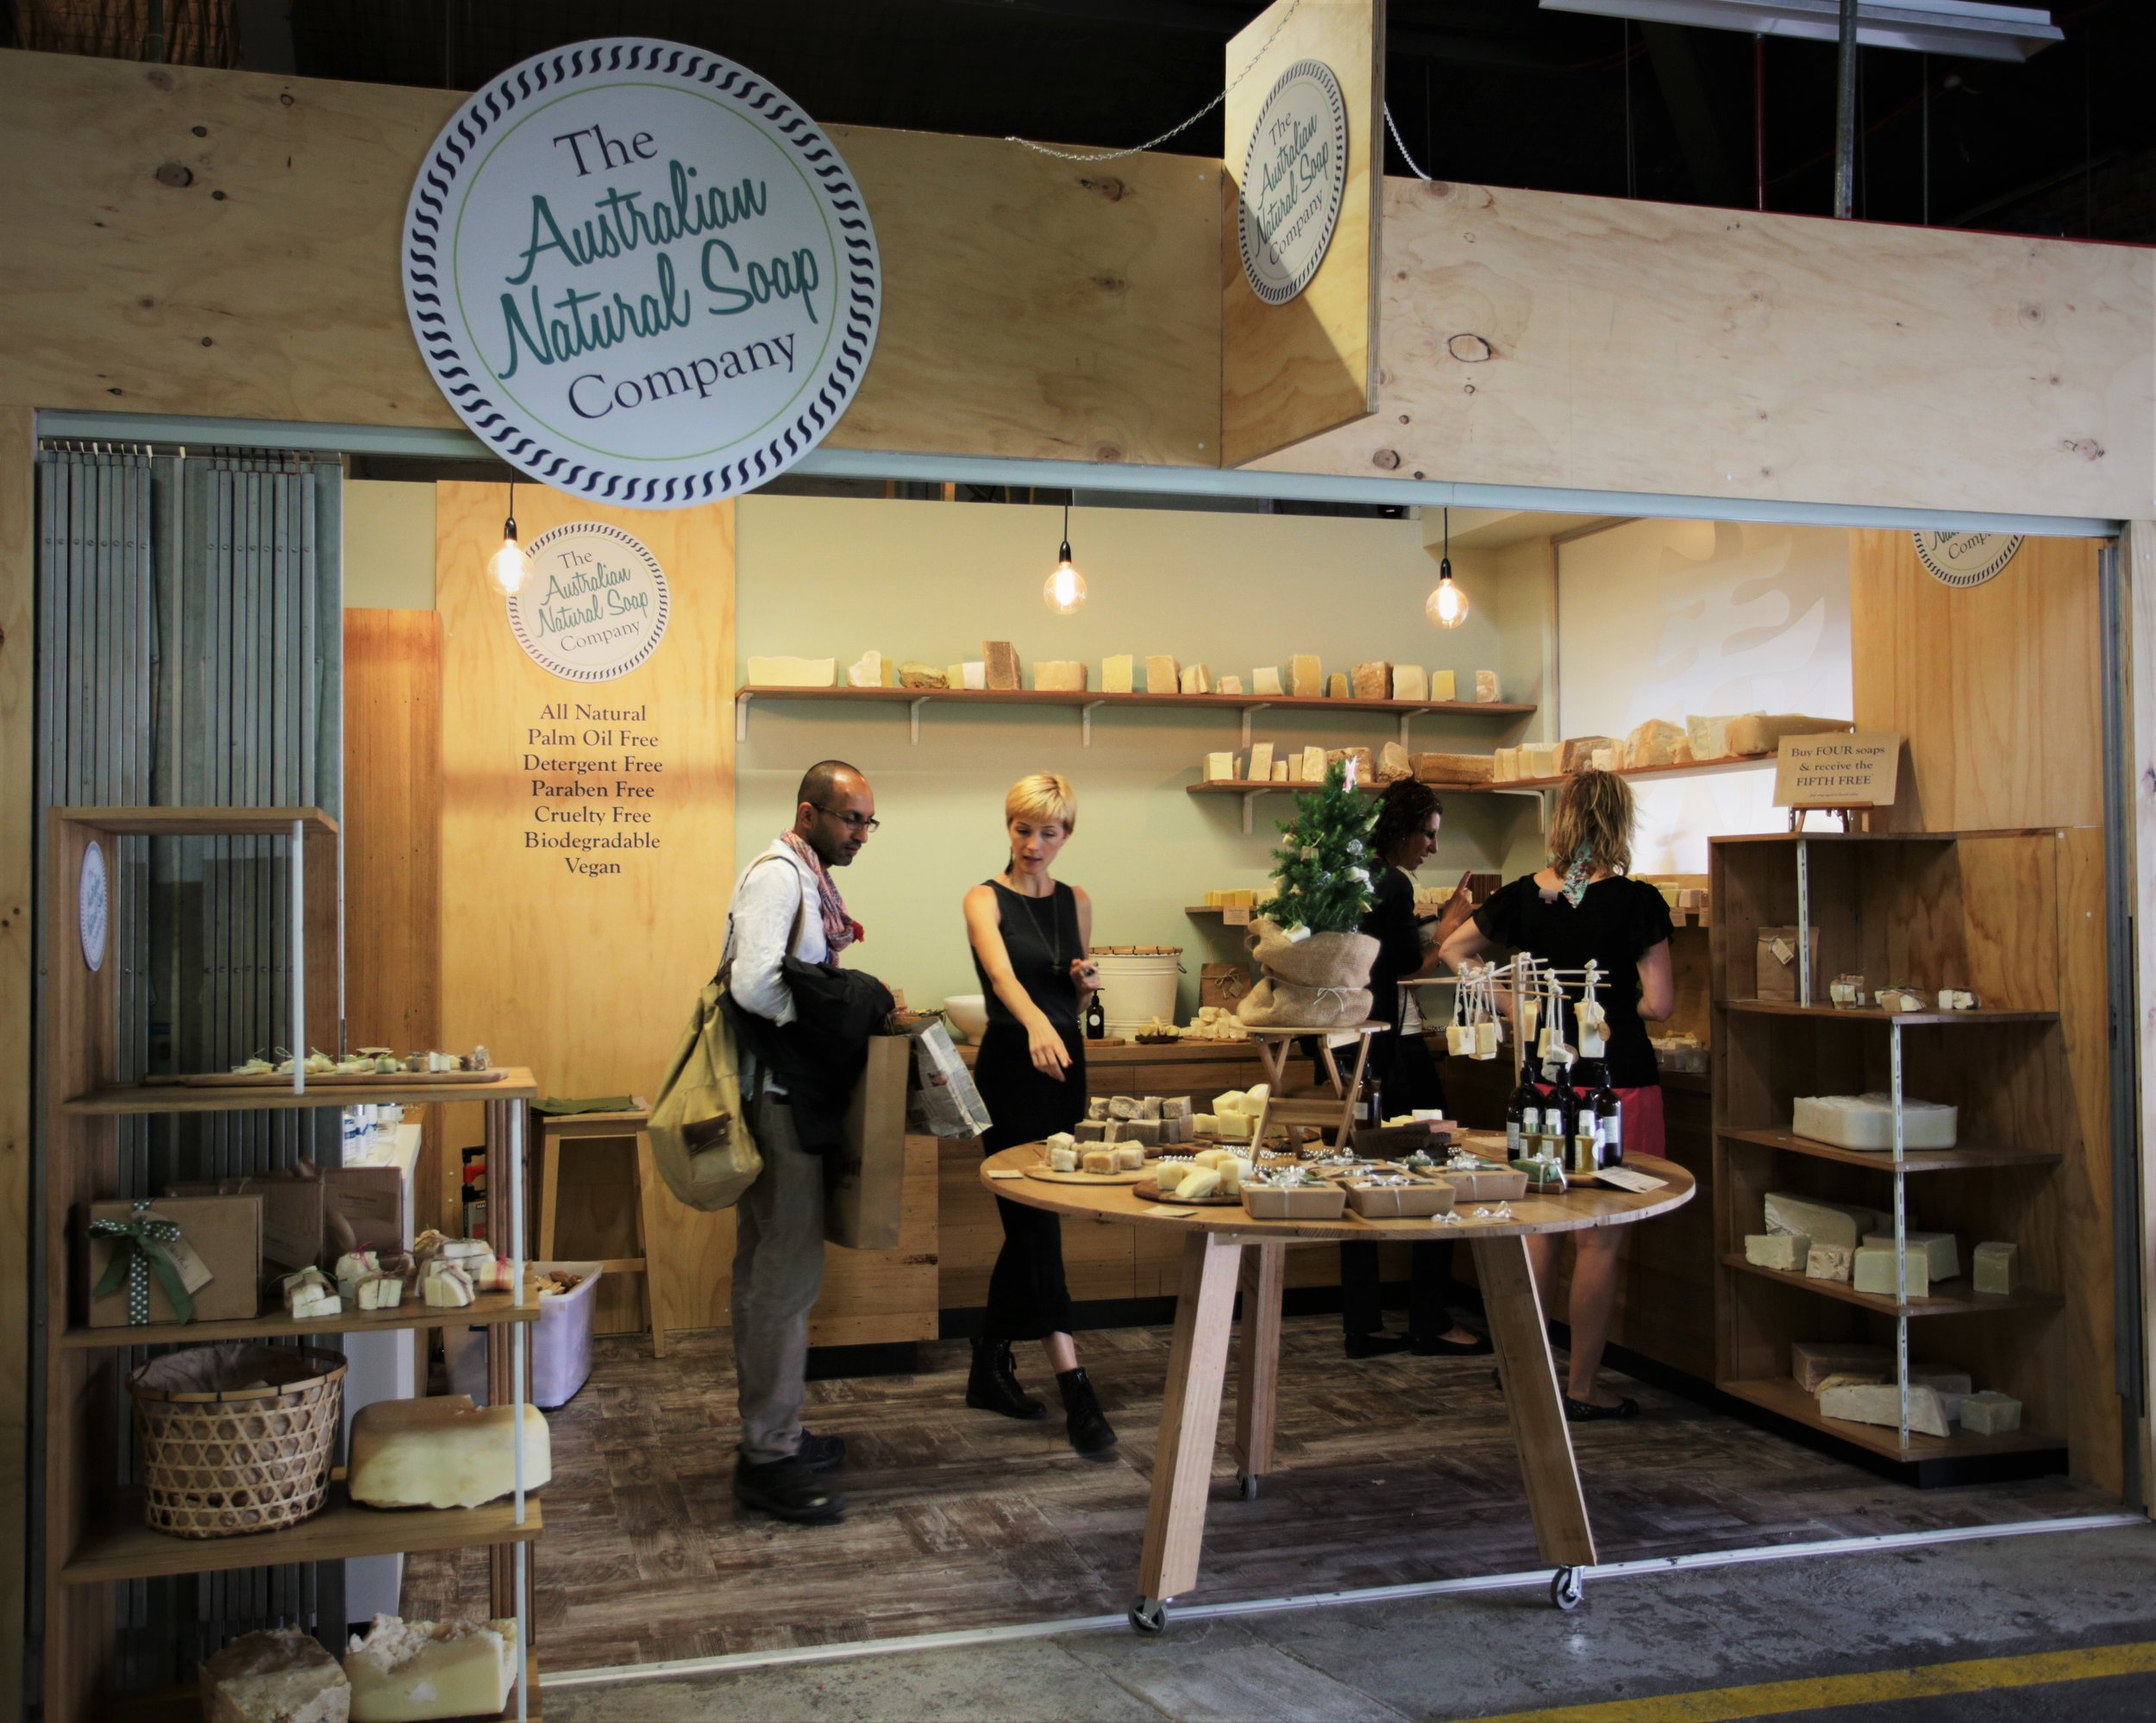 Australian Natural Soap Company